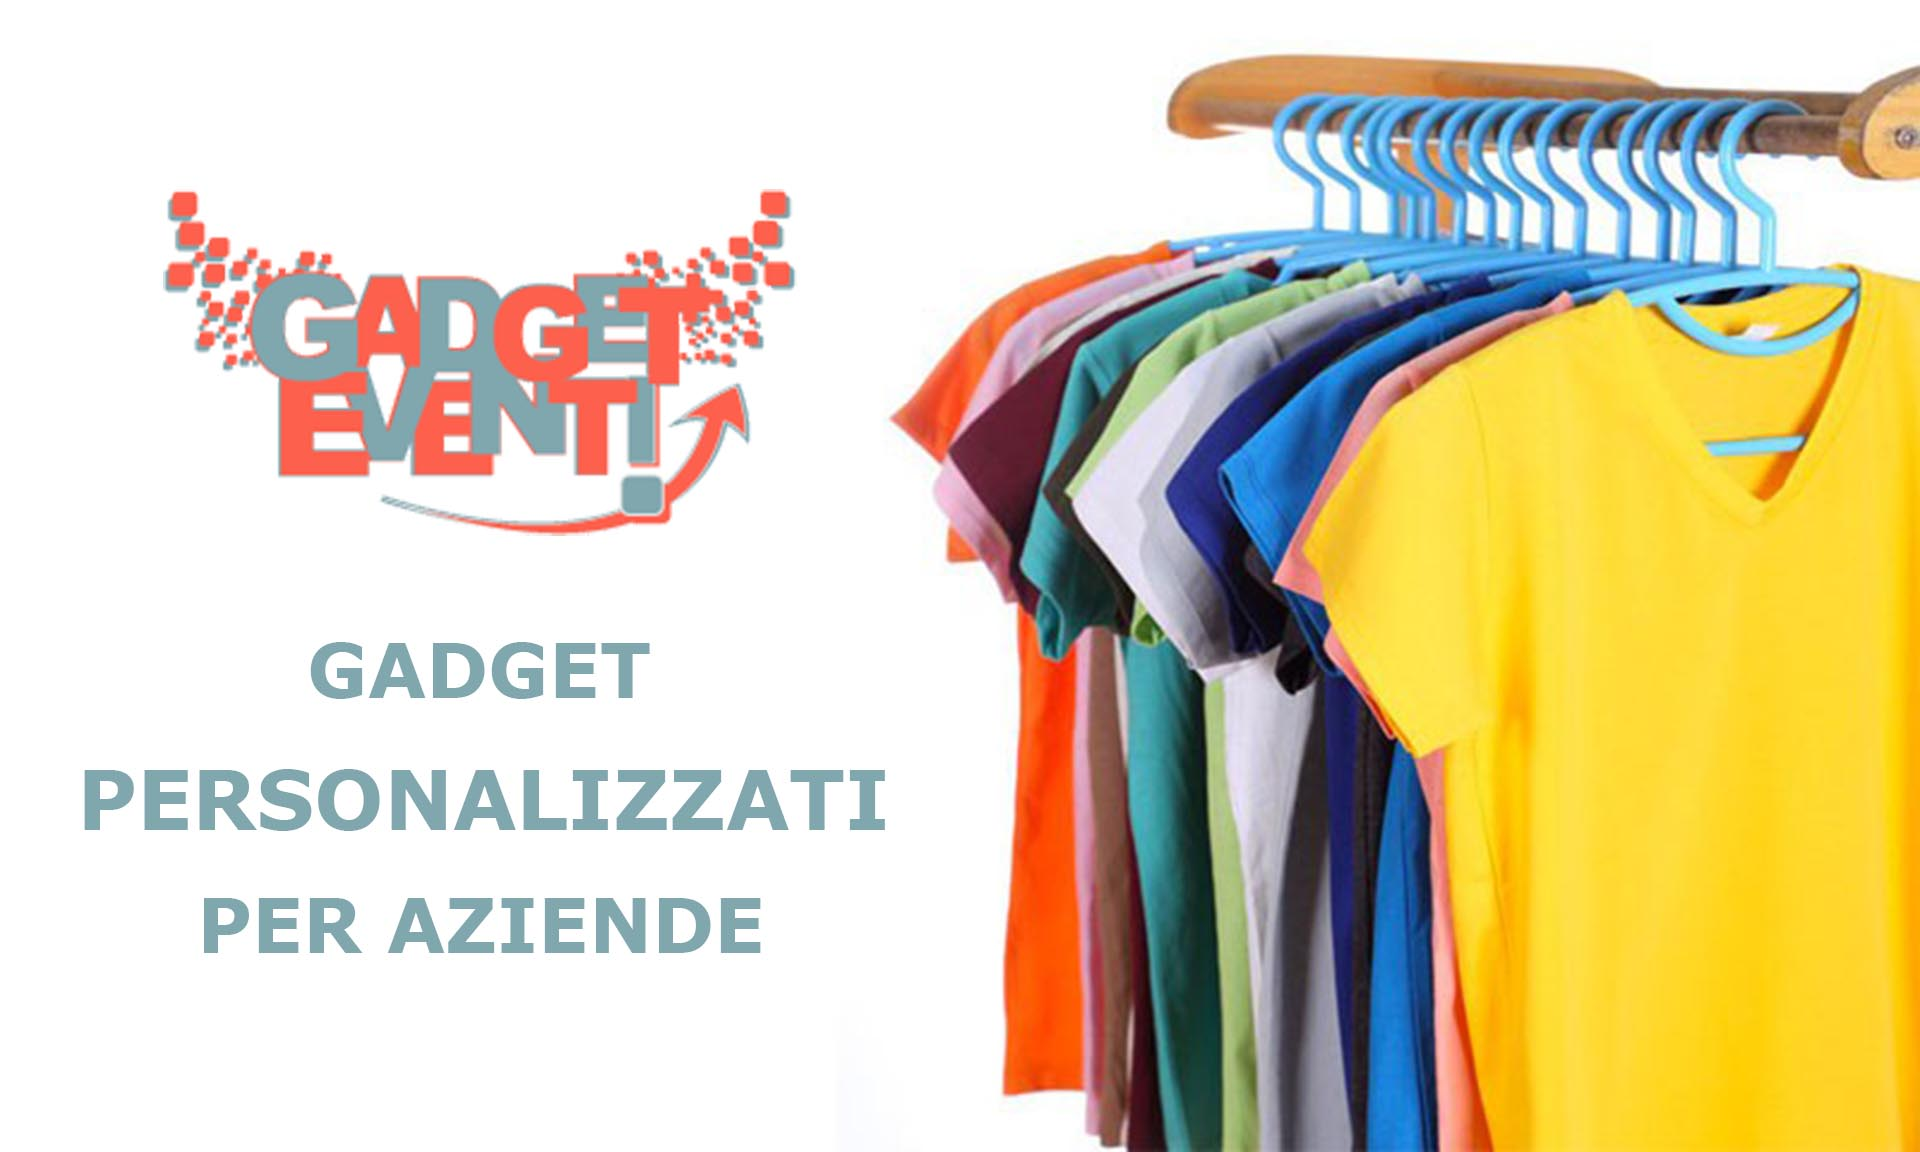 Gadget Personalizzati per Aziende Gadget Eventi